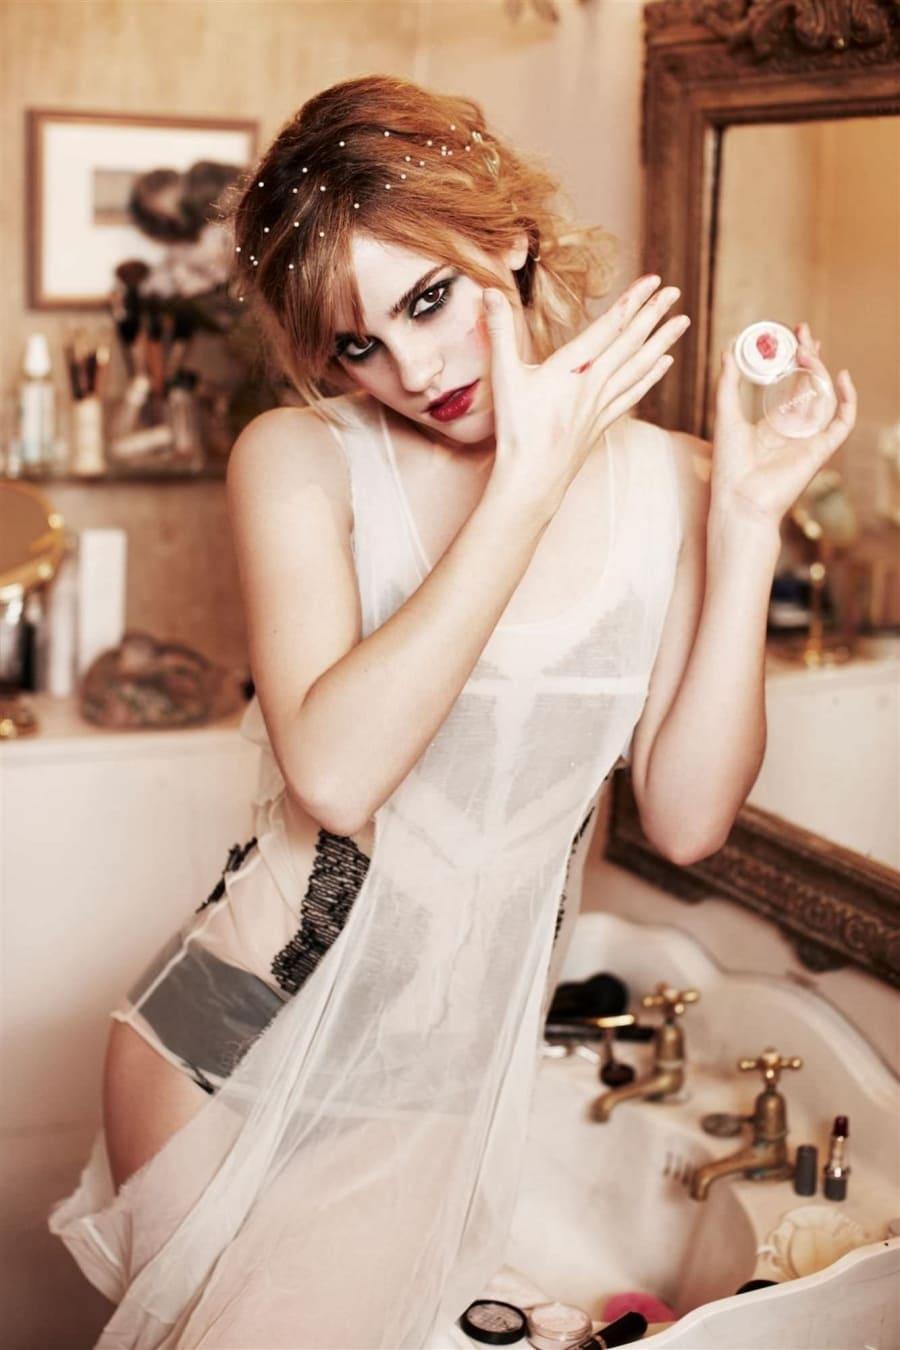 эмма уотсон фото в ванной комнате с ярким макияжем